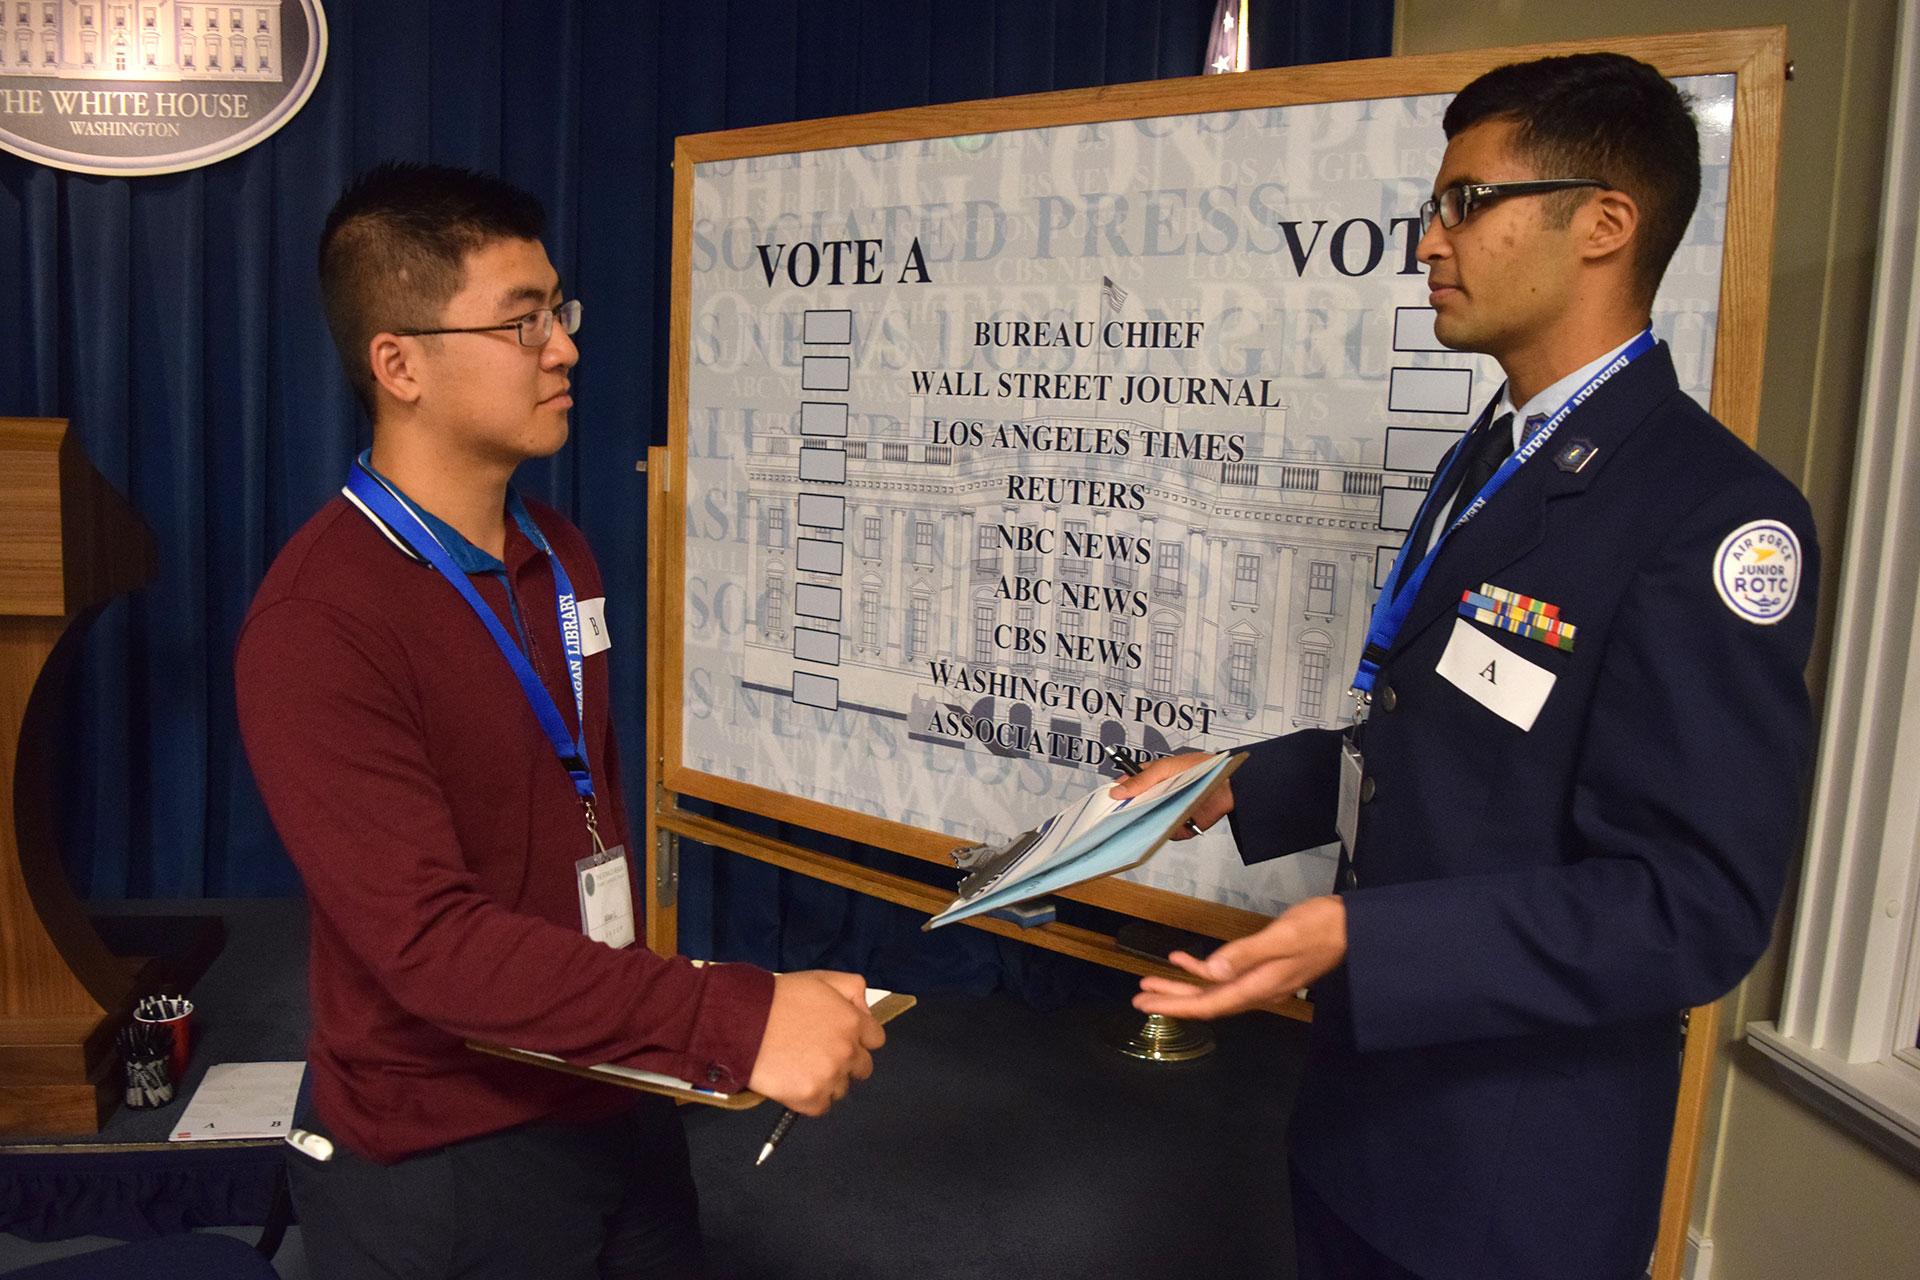 Leadership Programs For High School Students In Washington Dc